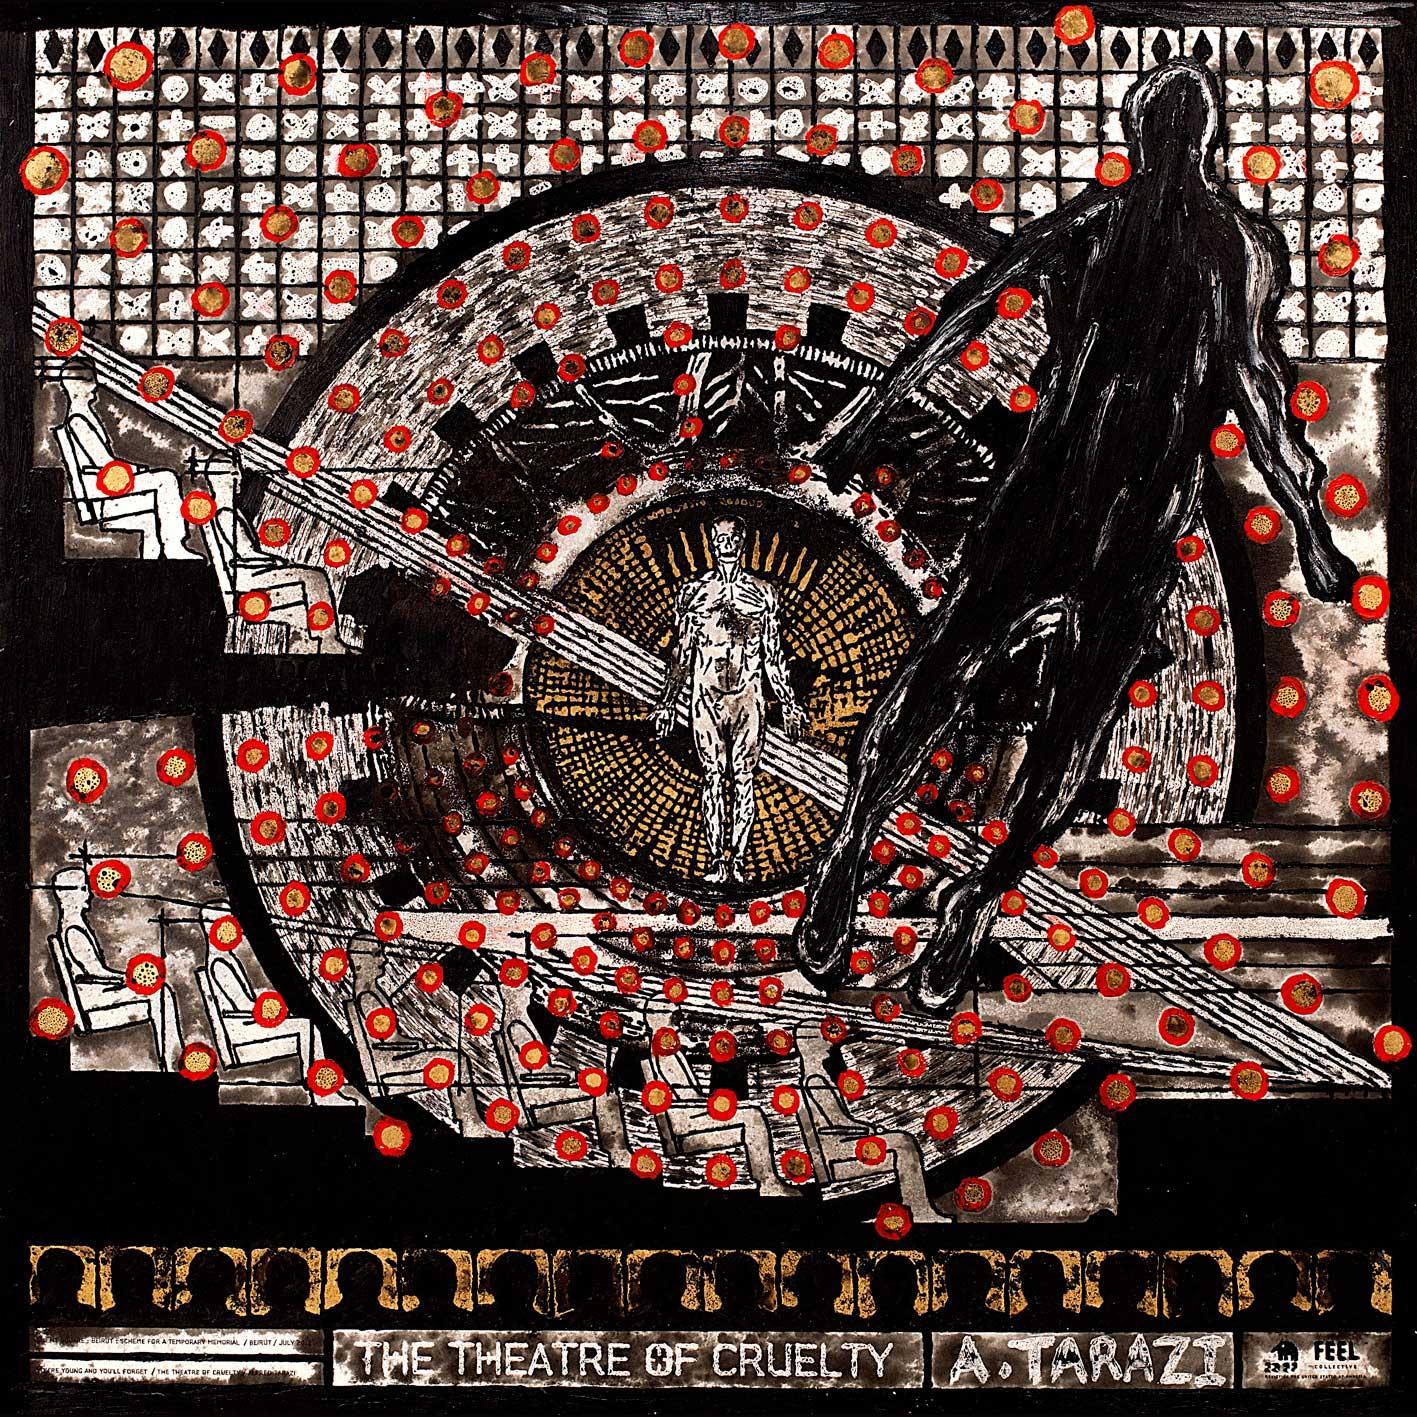 alfred_tarazi_the_oath_theatre_of_cruelty_2012.jpg